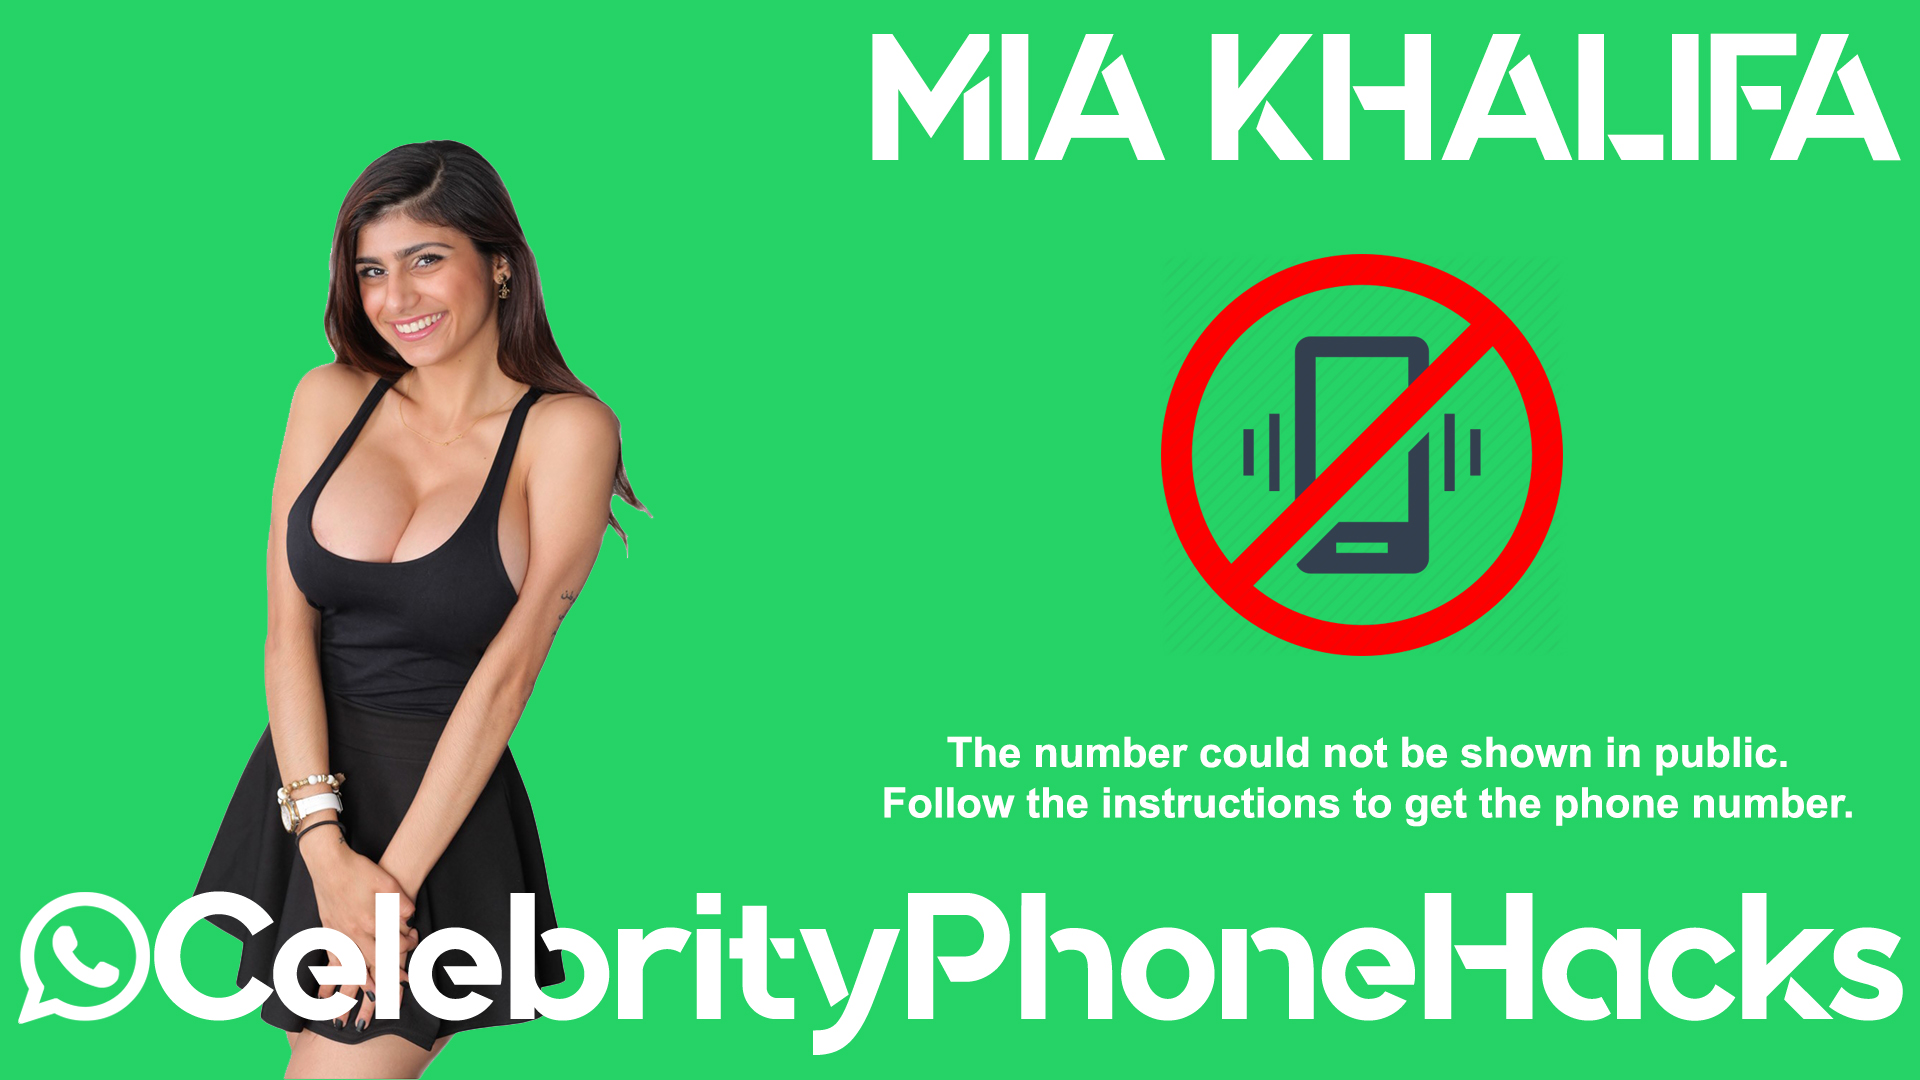 Mia Khalifa real phone number 2019 whatsapp hacked leaked